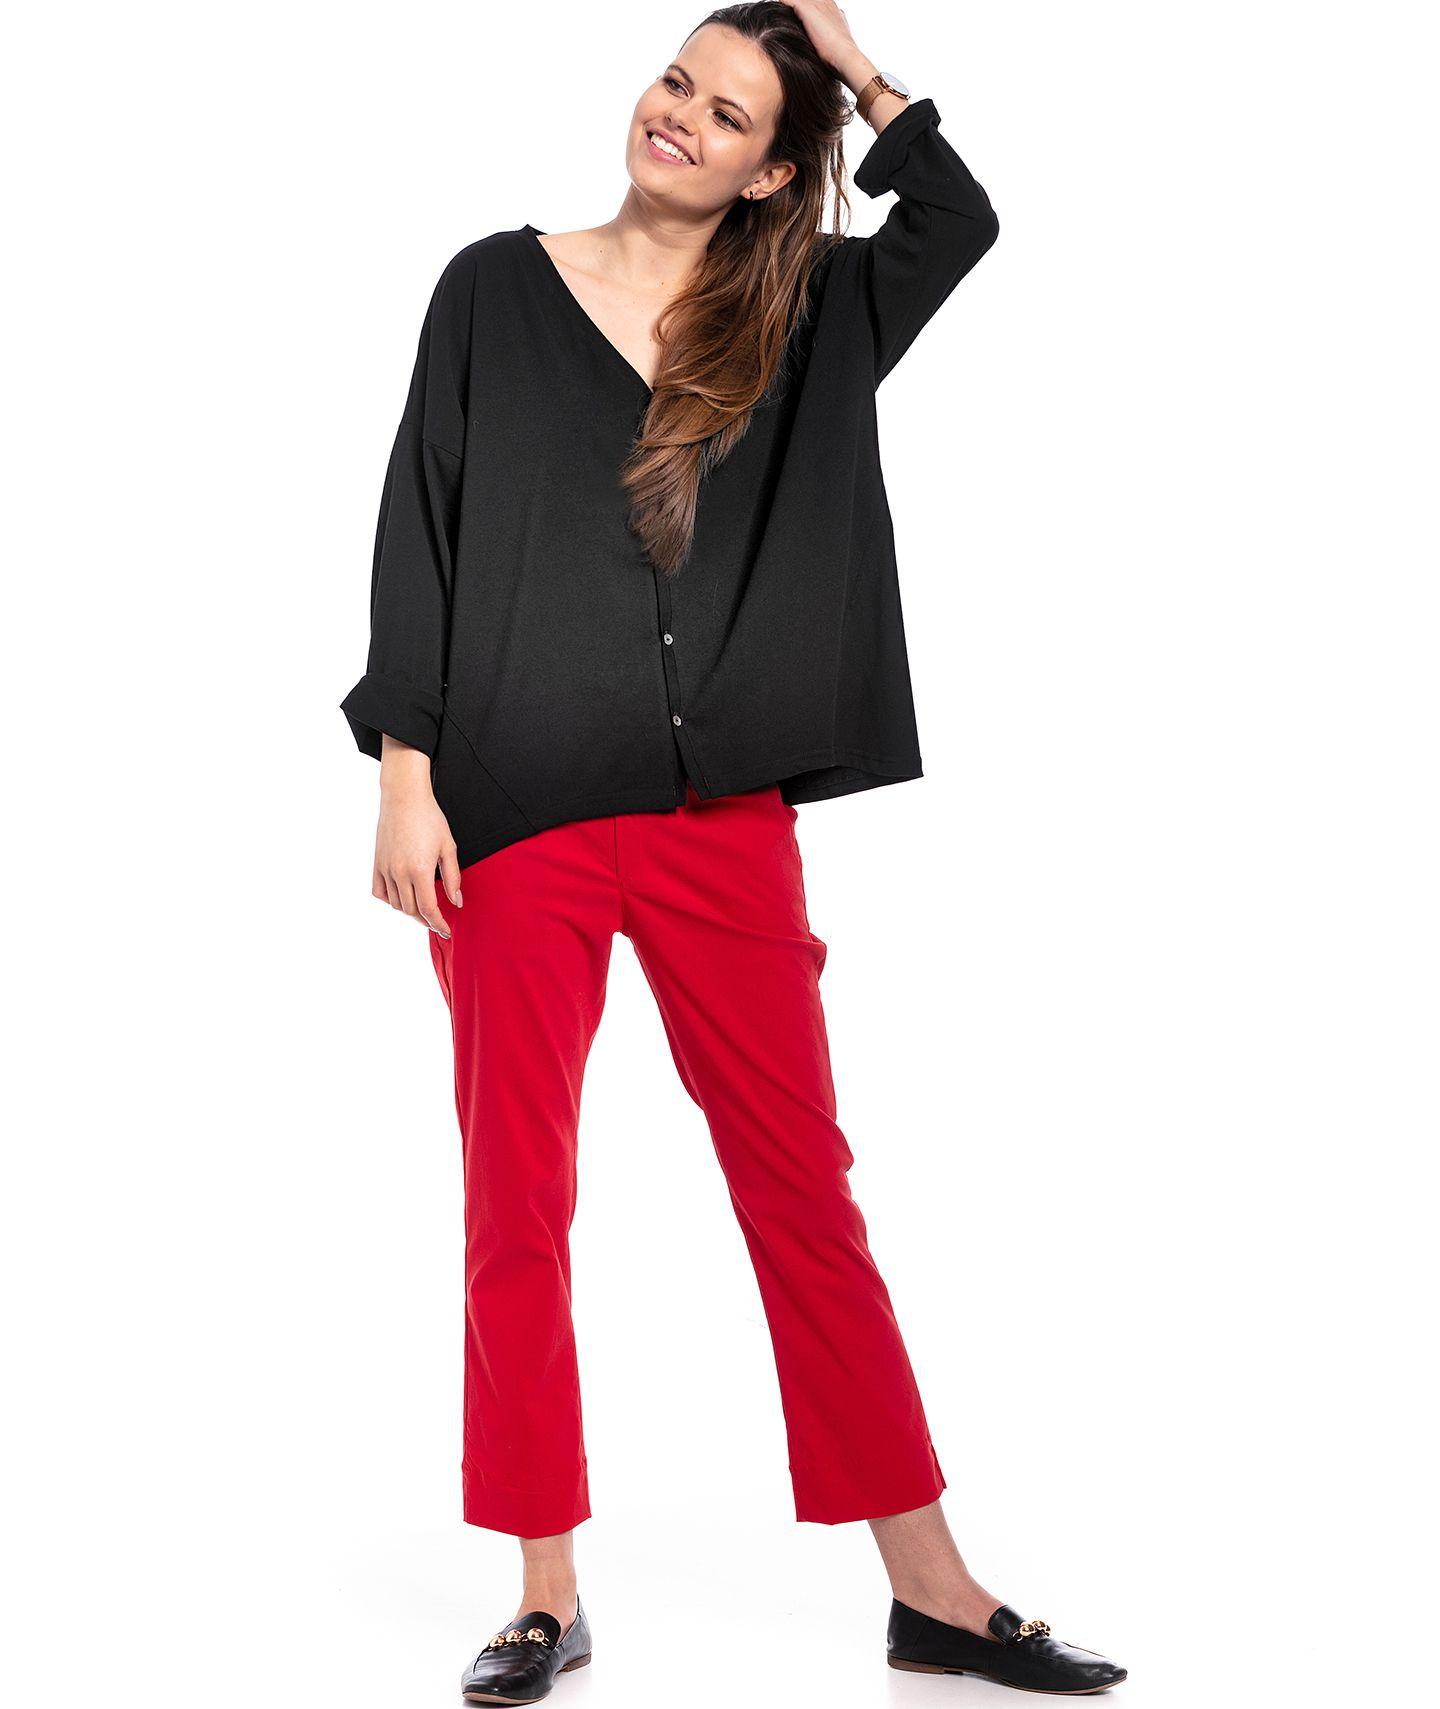 bluzka MARTINI black blouse